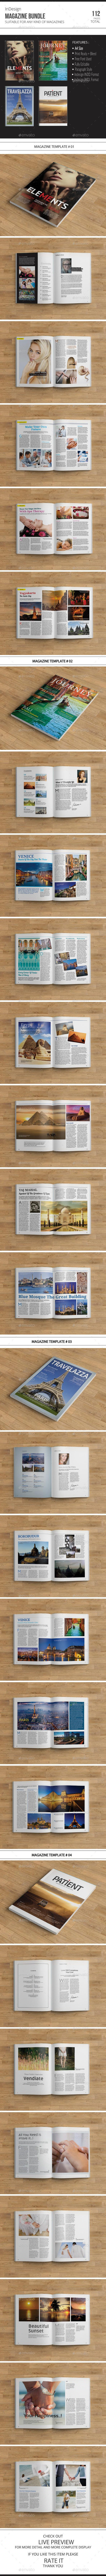 GraphicRiver magazine bundle 11219956